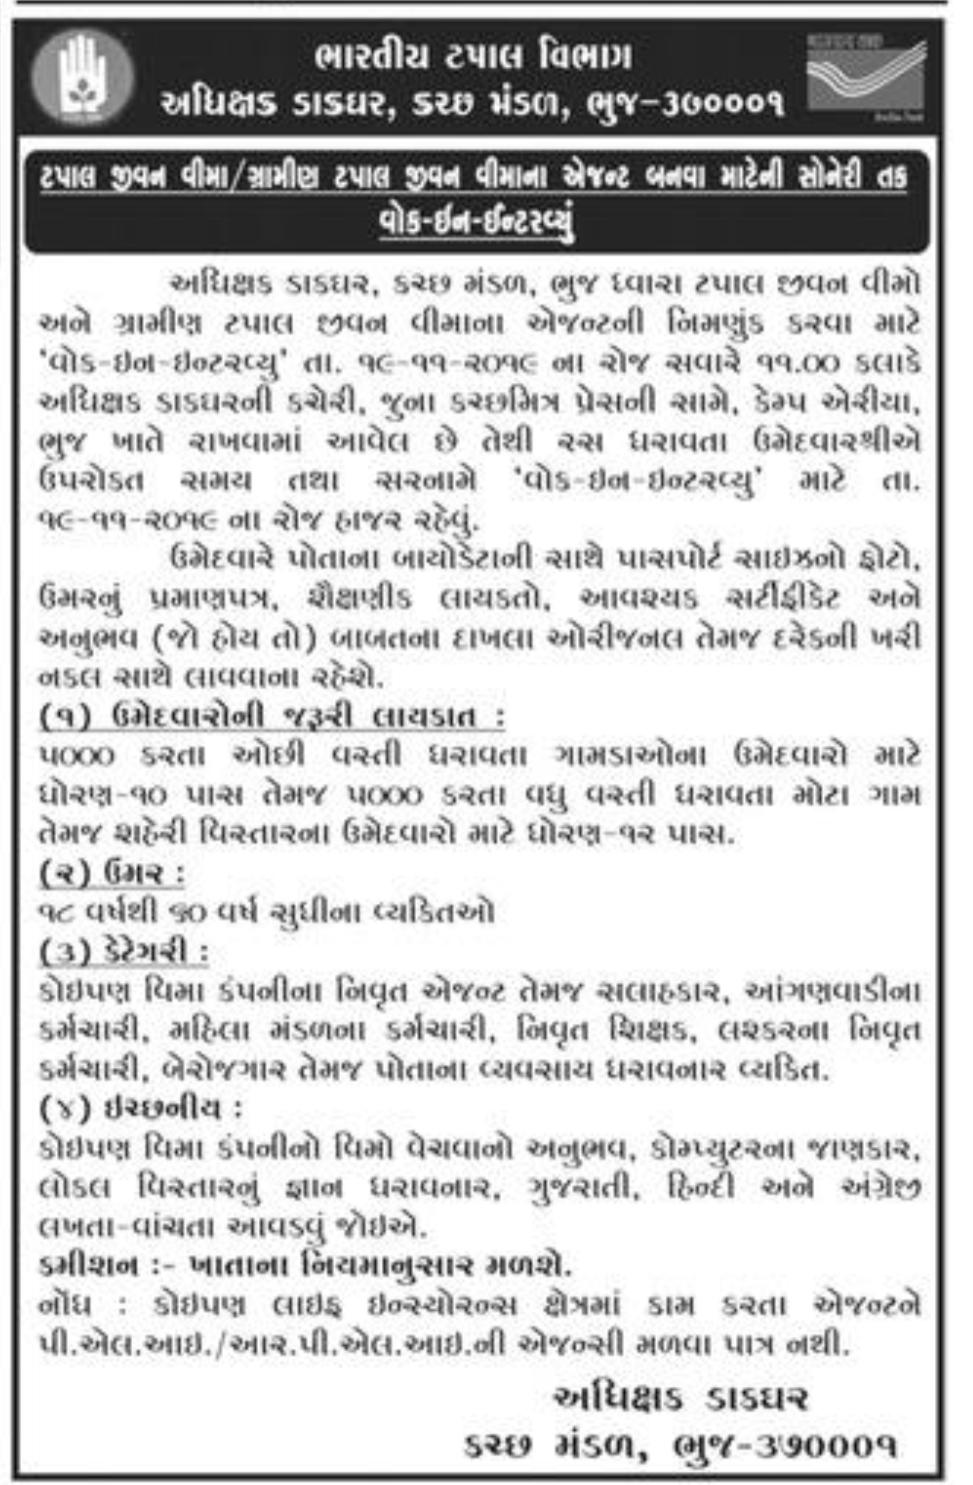 Postal Department, Kutch Recruitment for Gramin Dak Jeevan Bima Agent Posts 2019